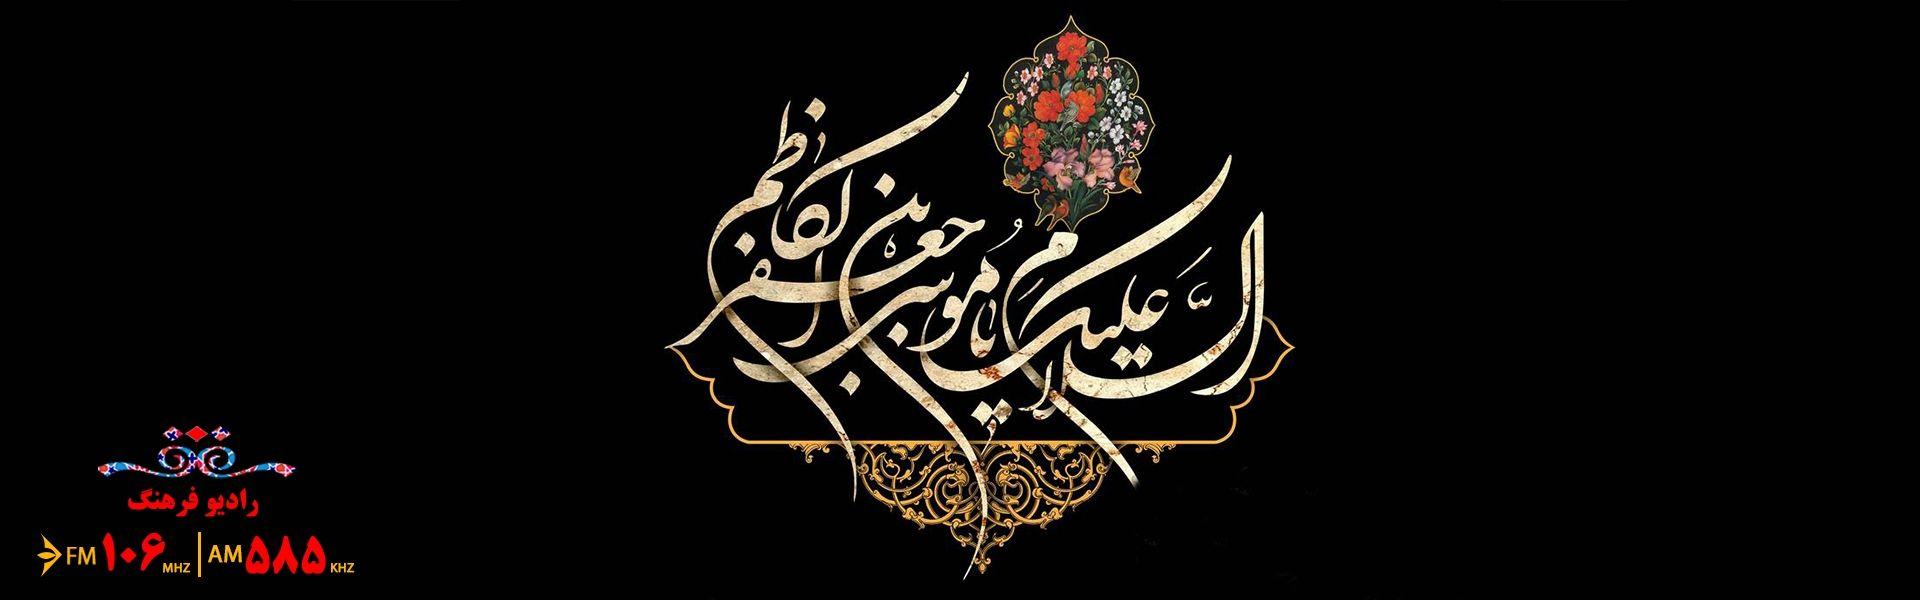 شهادت امام موسی کاظم علیه السلام تسلیت